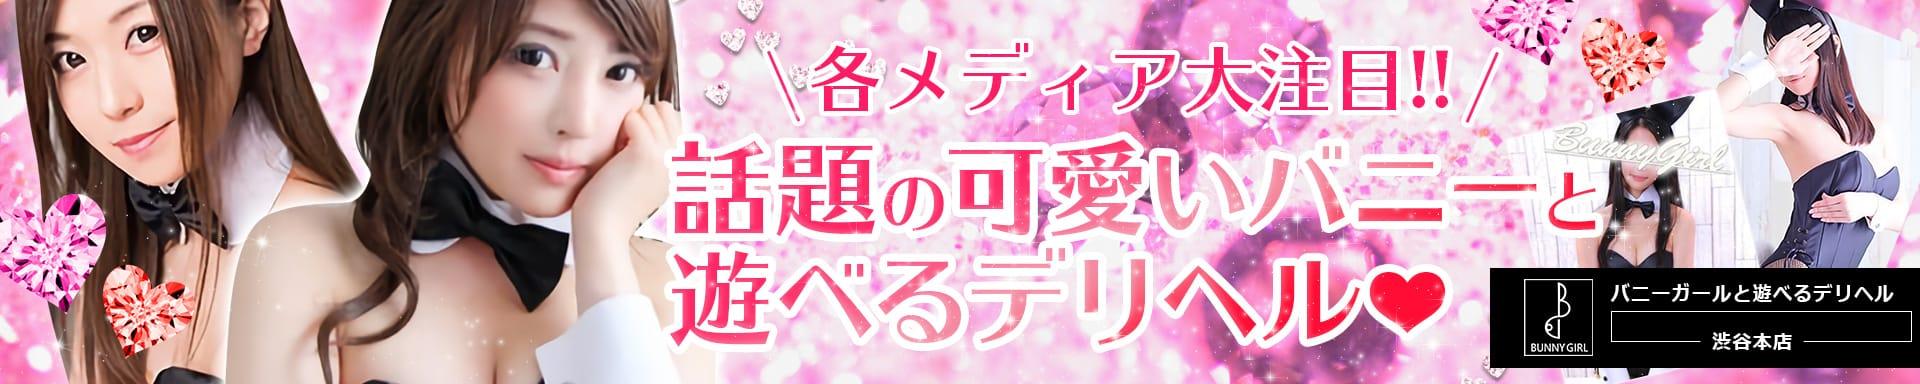 BUNNY GIRL~バニーガールと遊べる~渋谷本店 その3